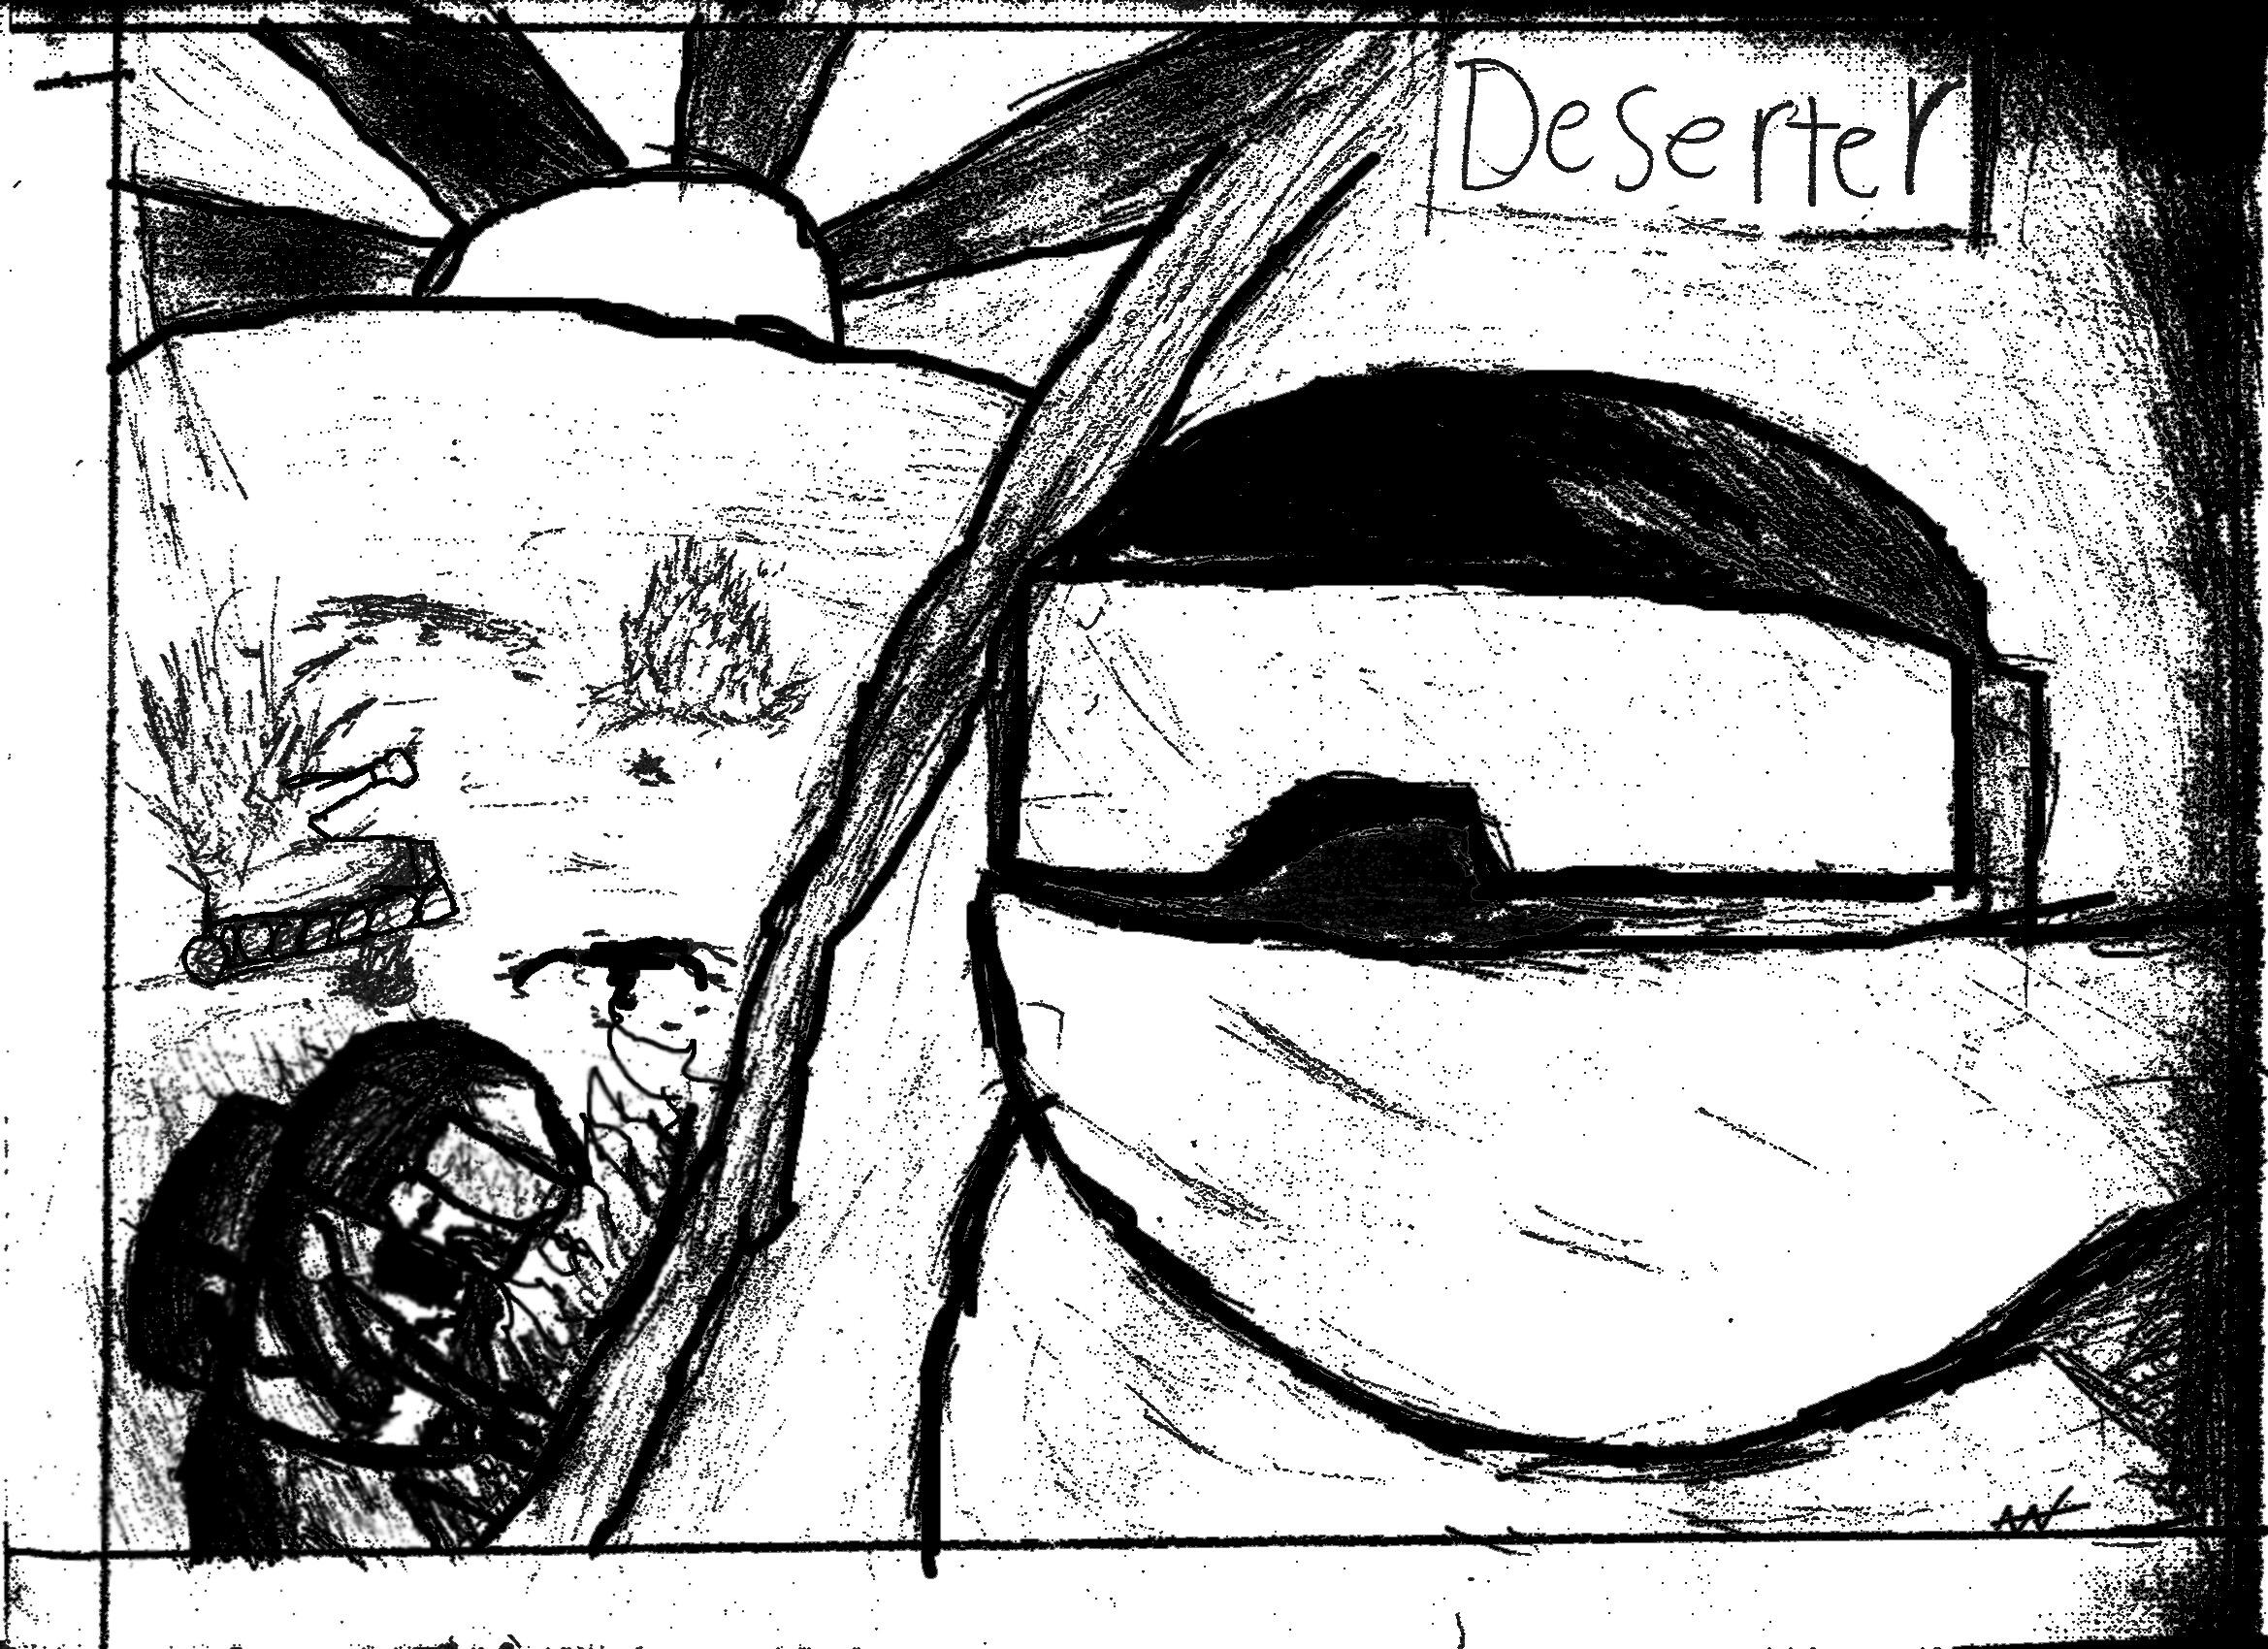 Deserter sketch pt 2